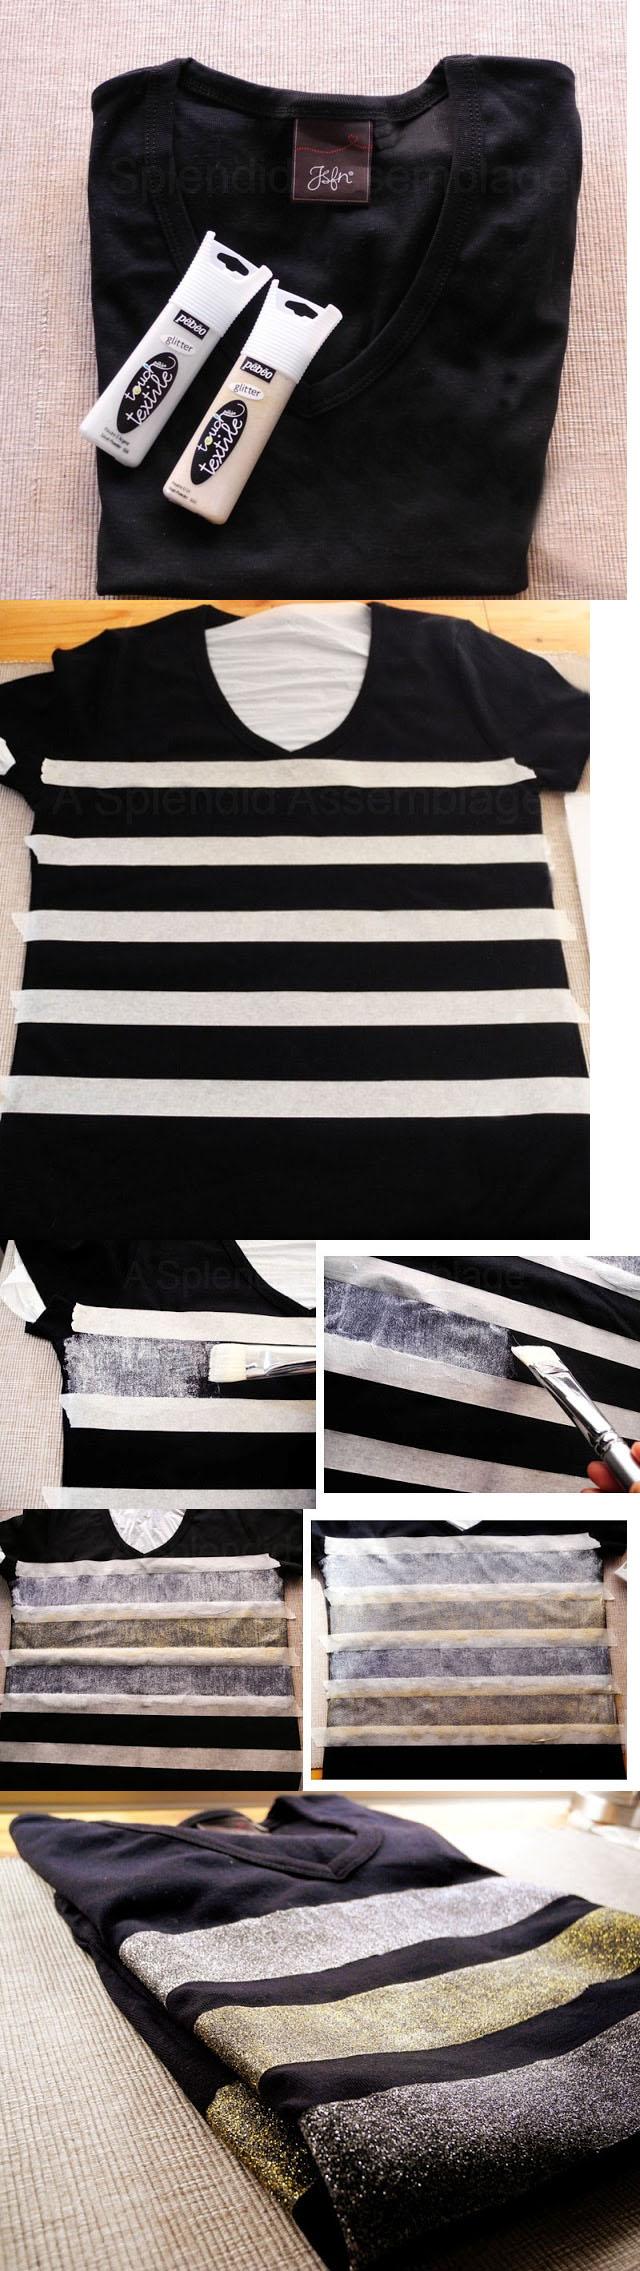 painted t shirt via. Black Bedroom Furniture Sets. Home Design Ideas